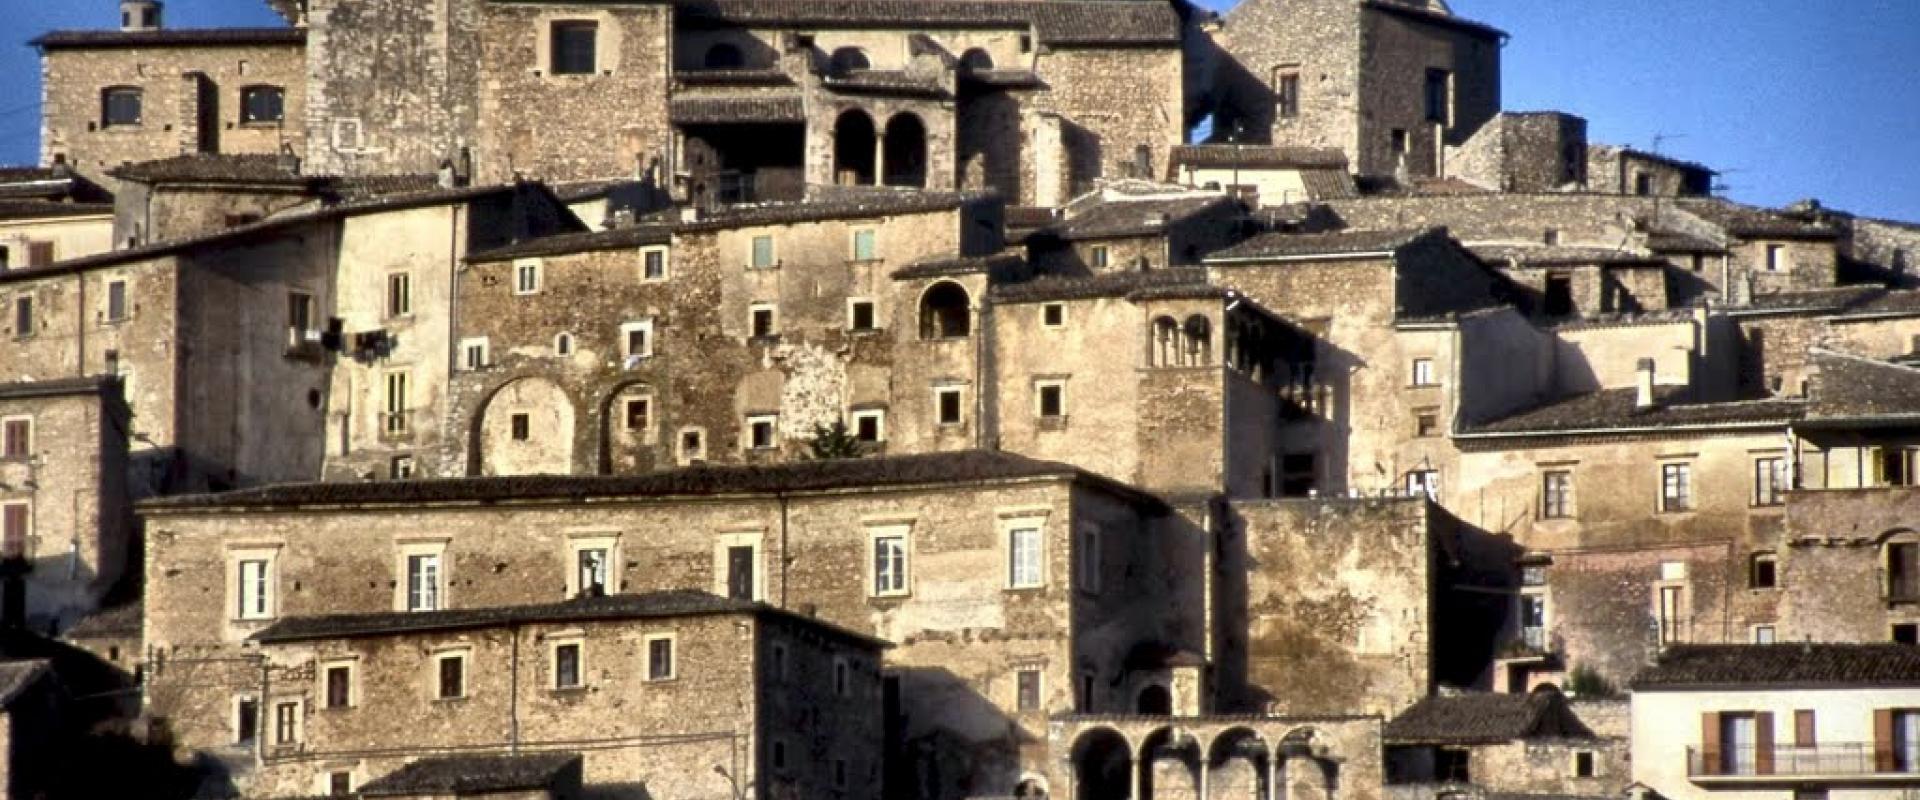 Visit of Navelli Abruzzo